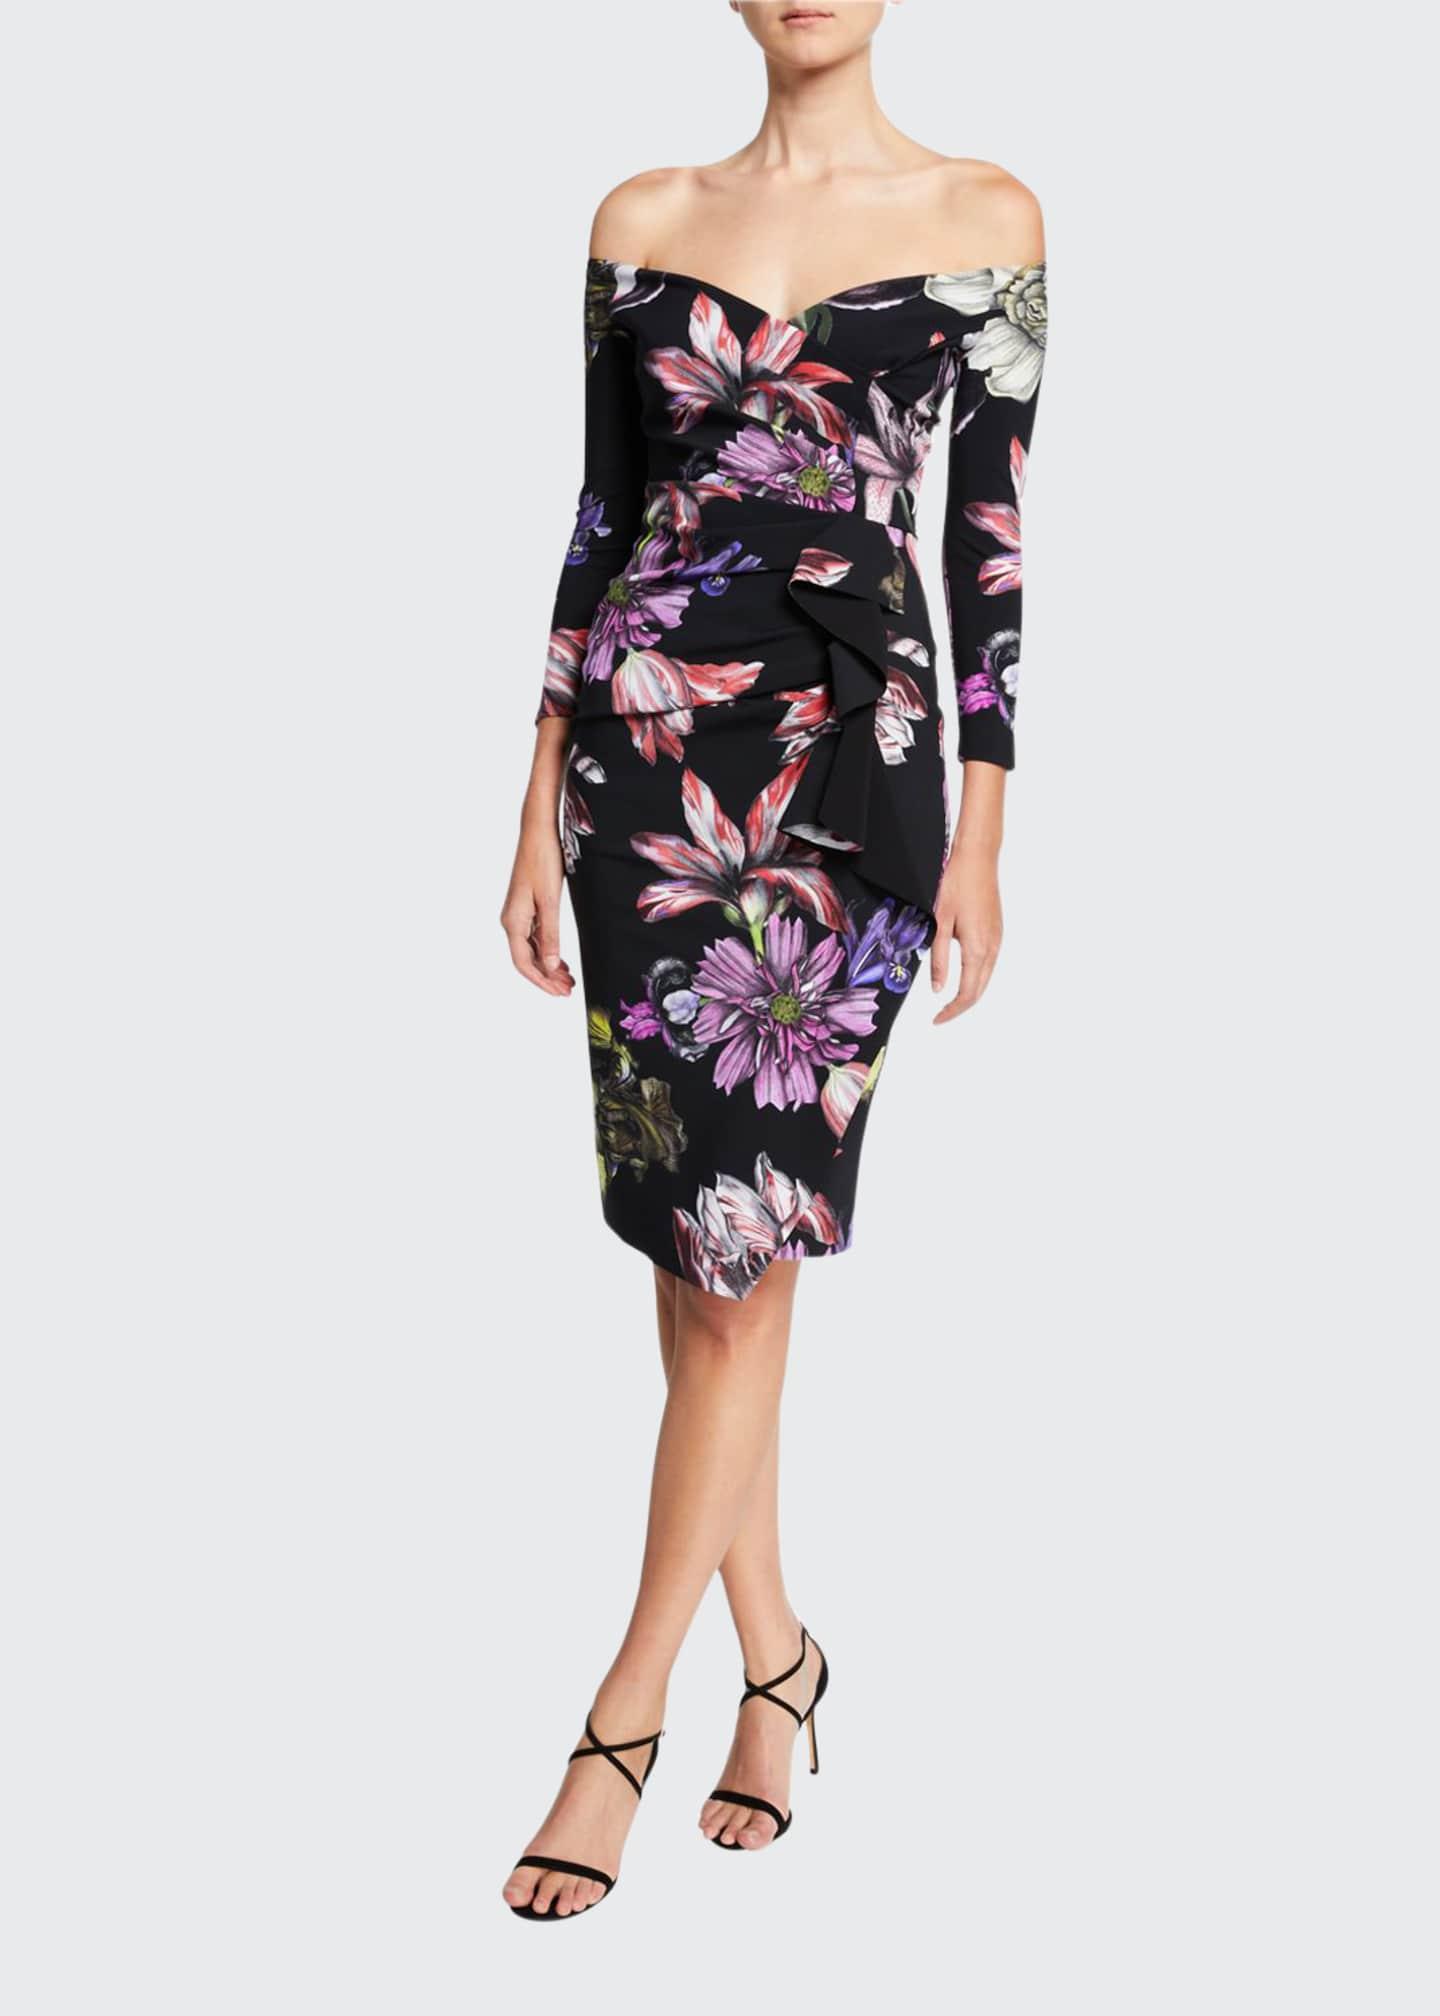 Chiara Boni La Petite Robe Floral Off-the-Shoulder 3/4-Sleeve